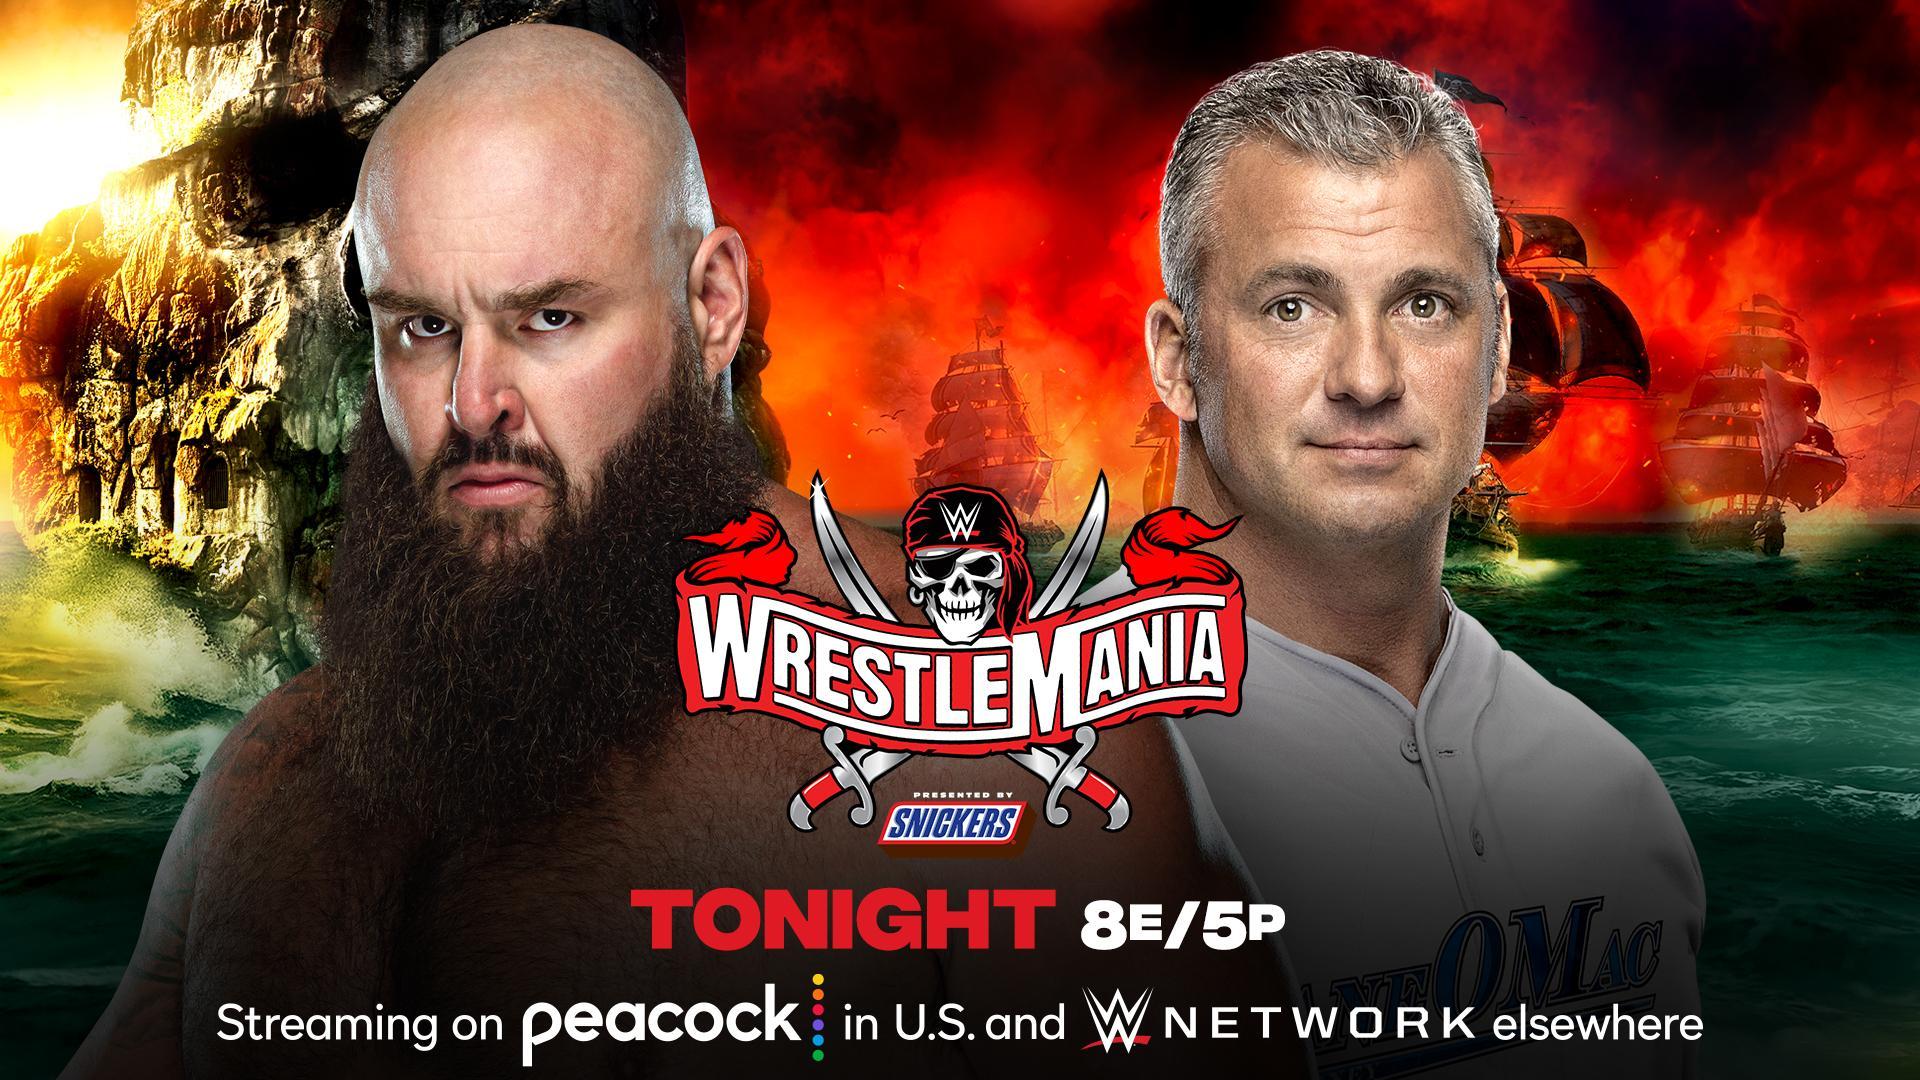 WrestleMania 37. Braun Strowman vs. Shane McMahon